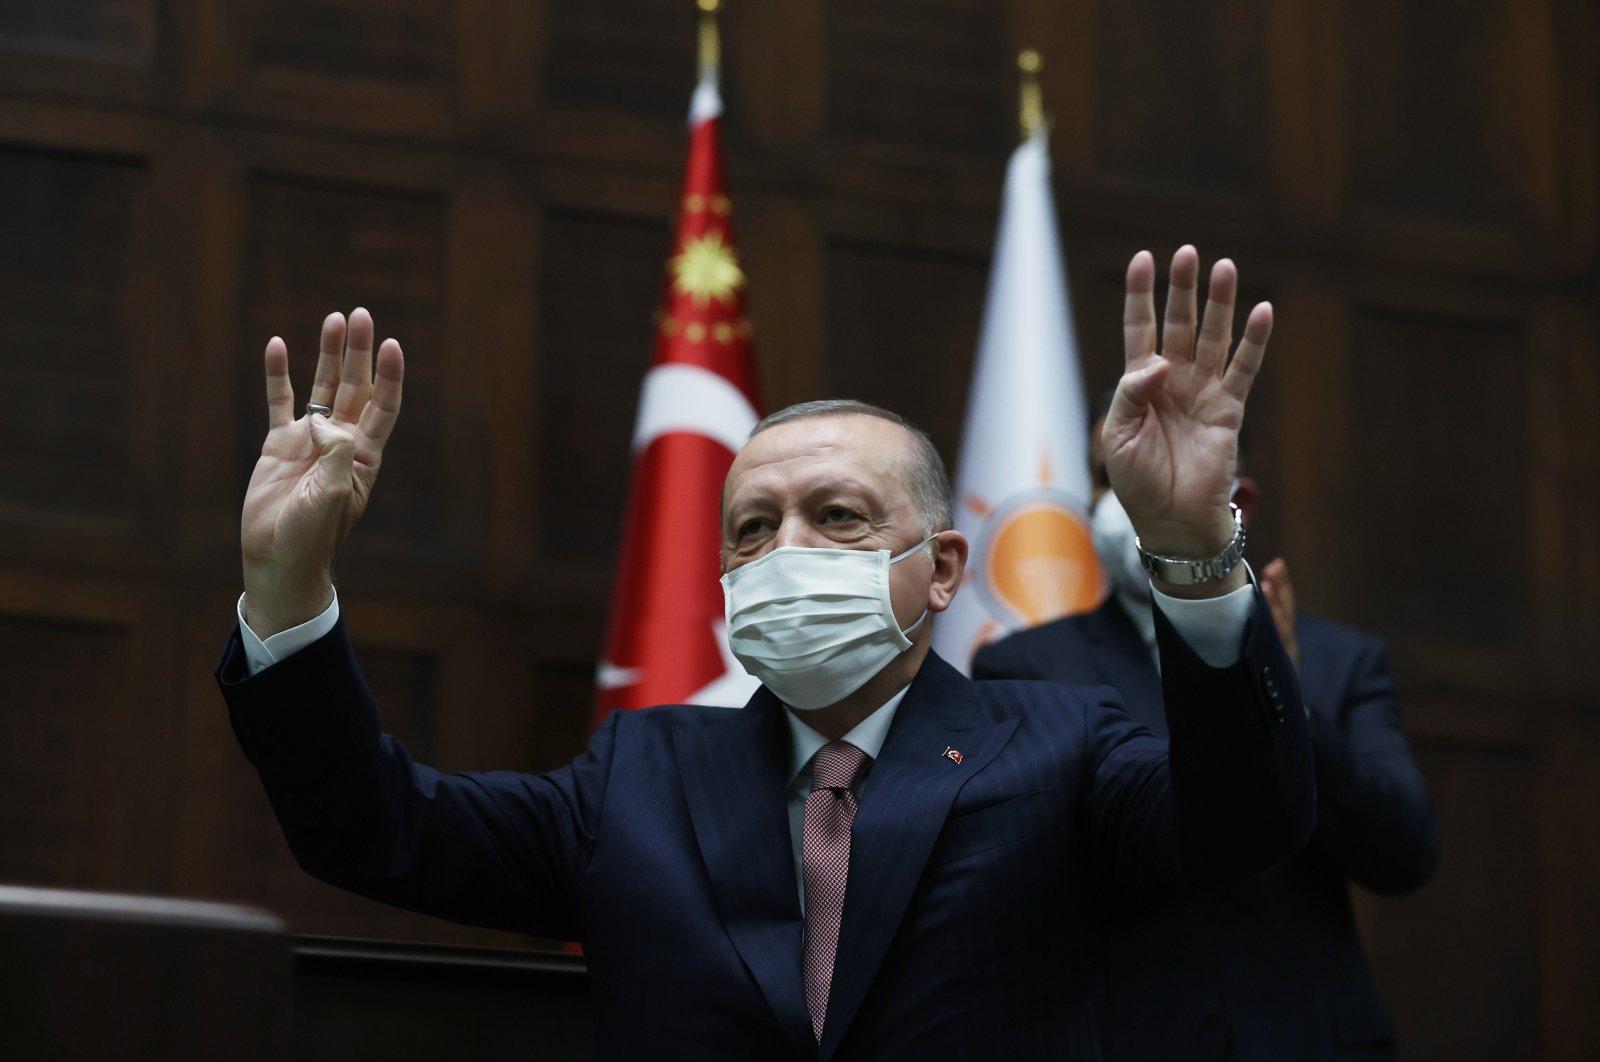 President Recep Tayyip Erdoğan salutes AK Party members during a meeting in capital Ankara, Turkey, June 30, 2021. (AA Photo)